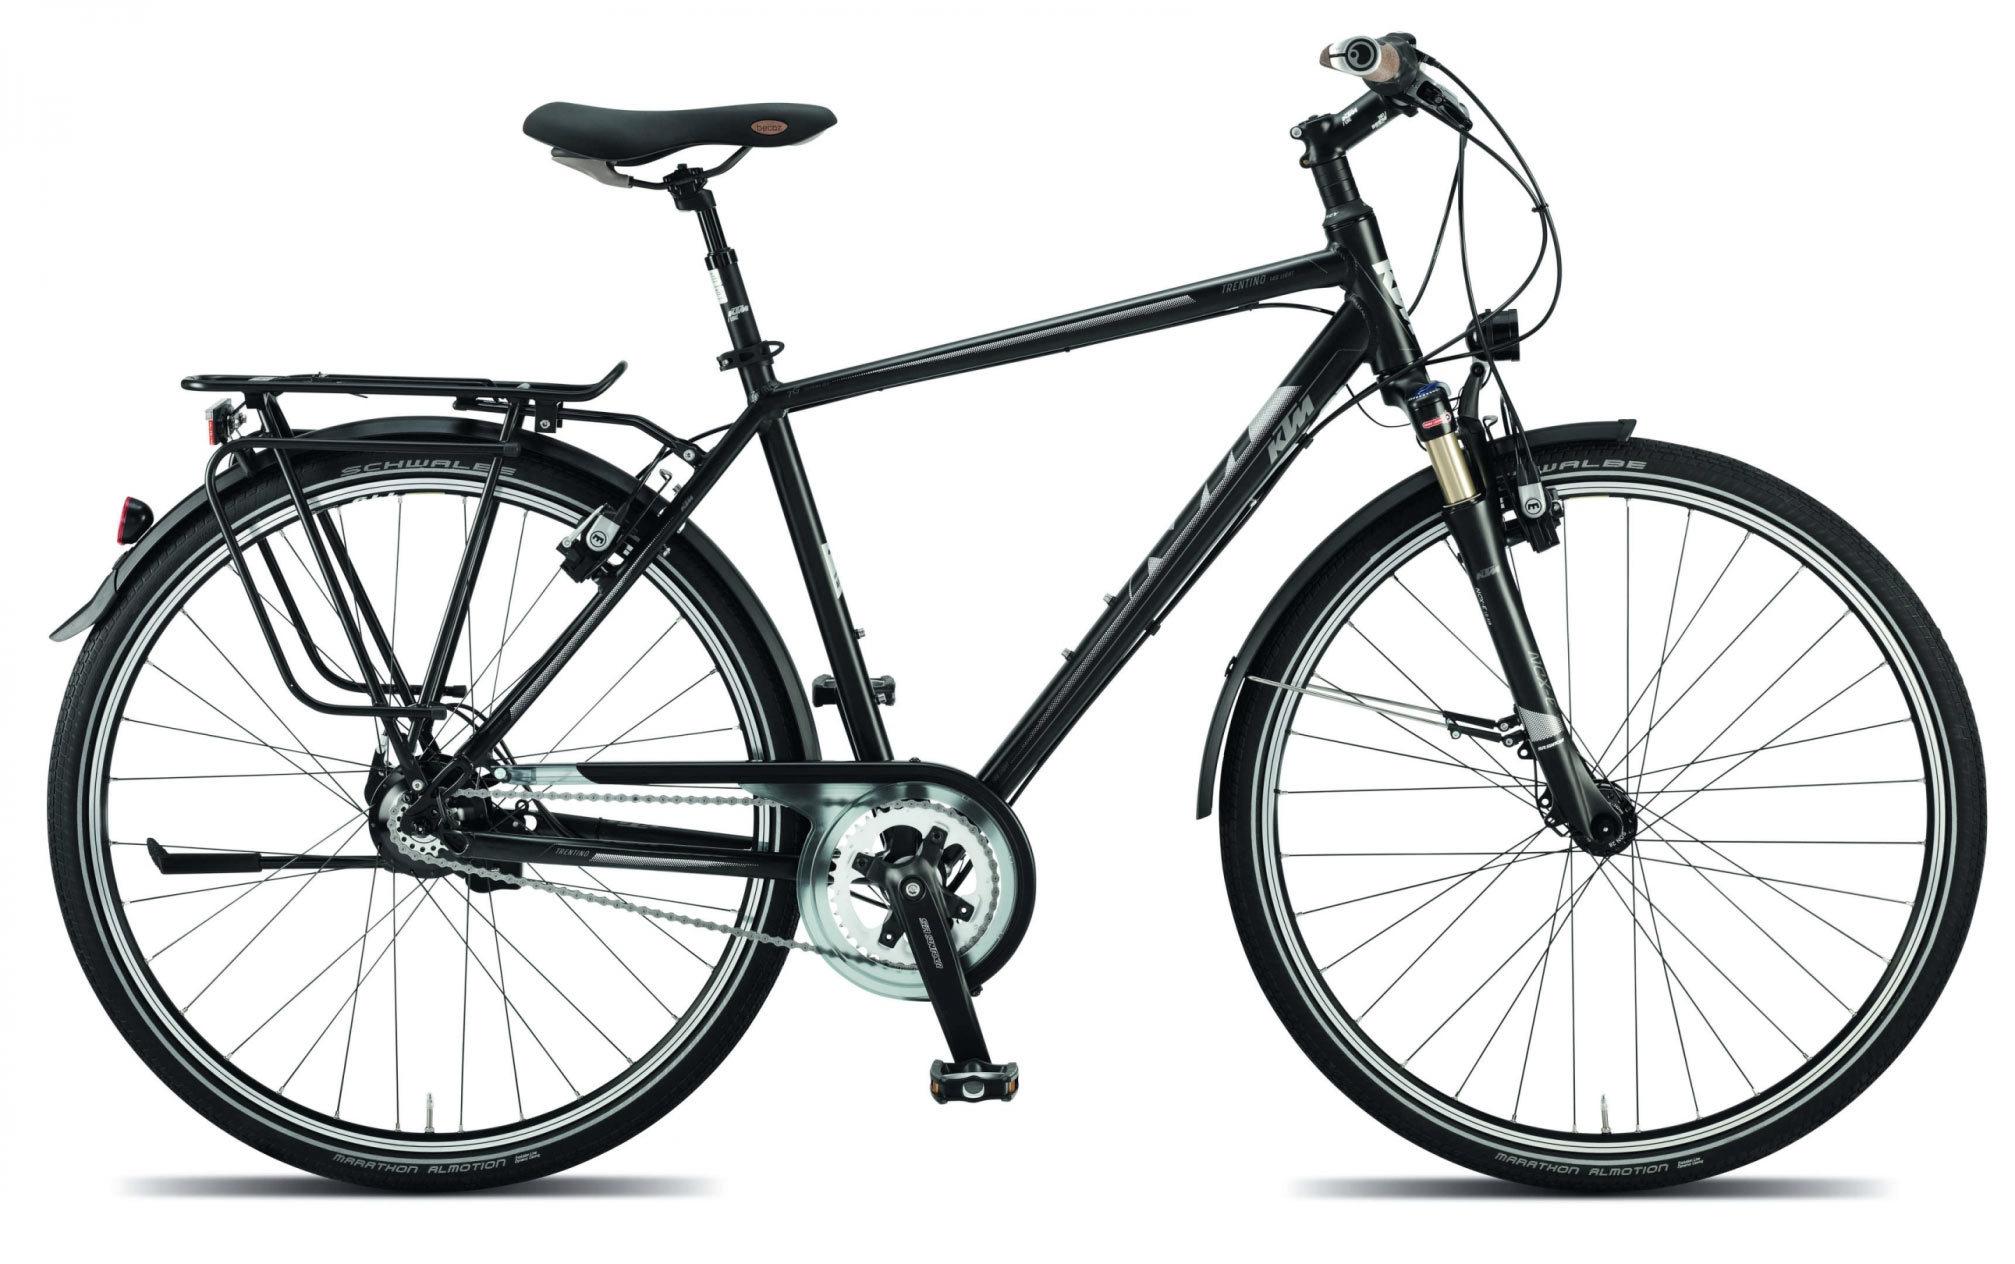 herren trekking fahrrad ktm trentino 14r light magura hs33 rohloff 56cm 2015 ebay. Black Bedroom Furniture Sets. Home Design Ideas